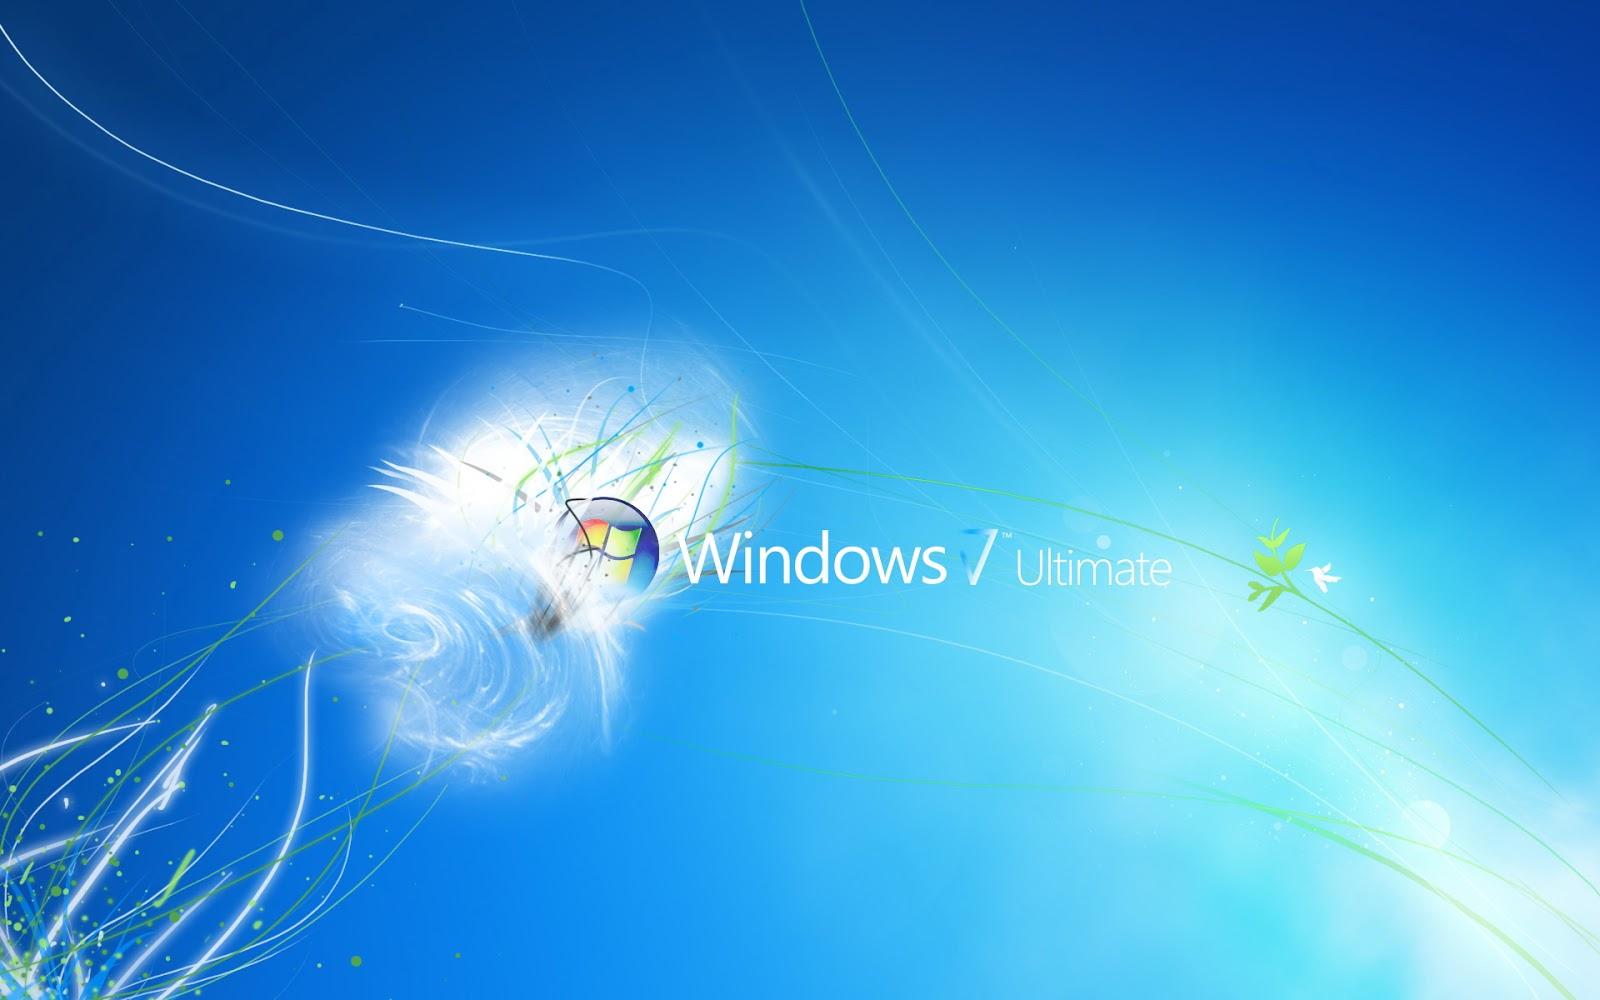 crack windows 7 ultimate 32 bits español